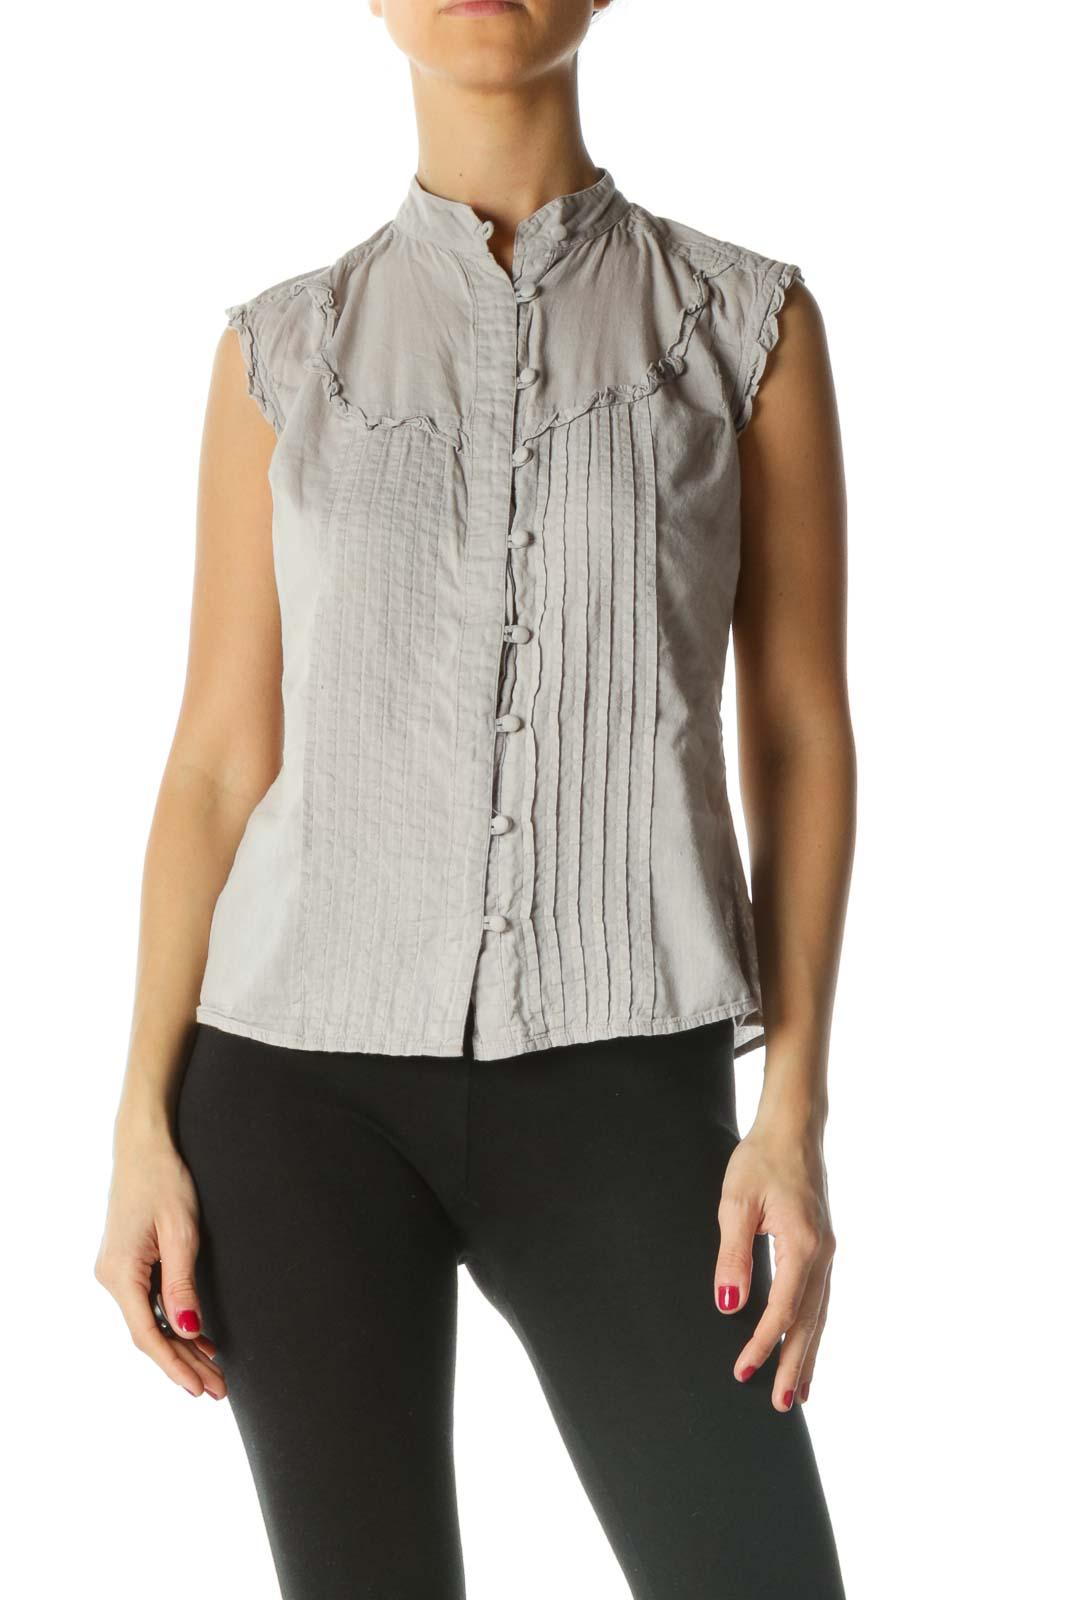 Gray Pleated Ruffle Detail Knit Sleeveless Top